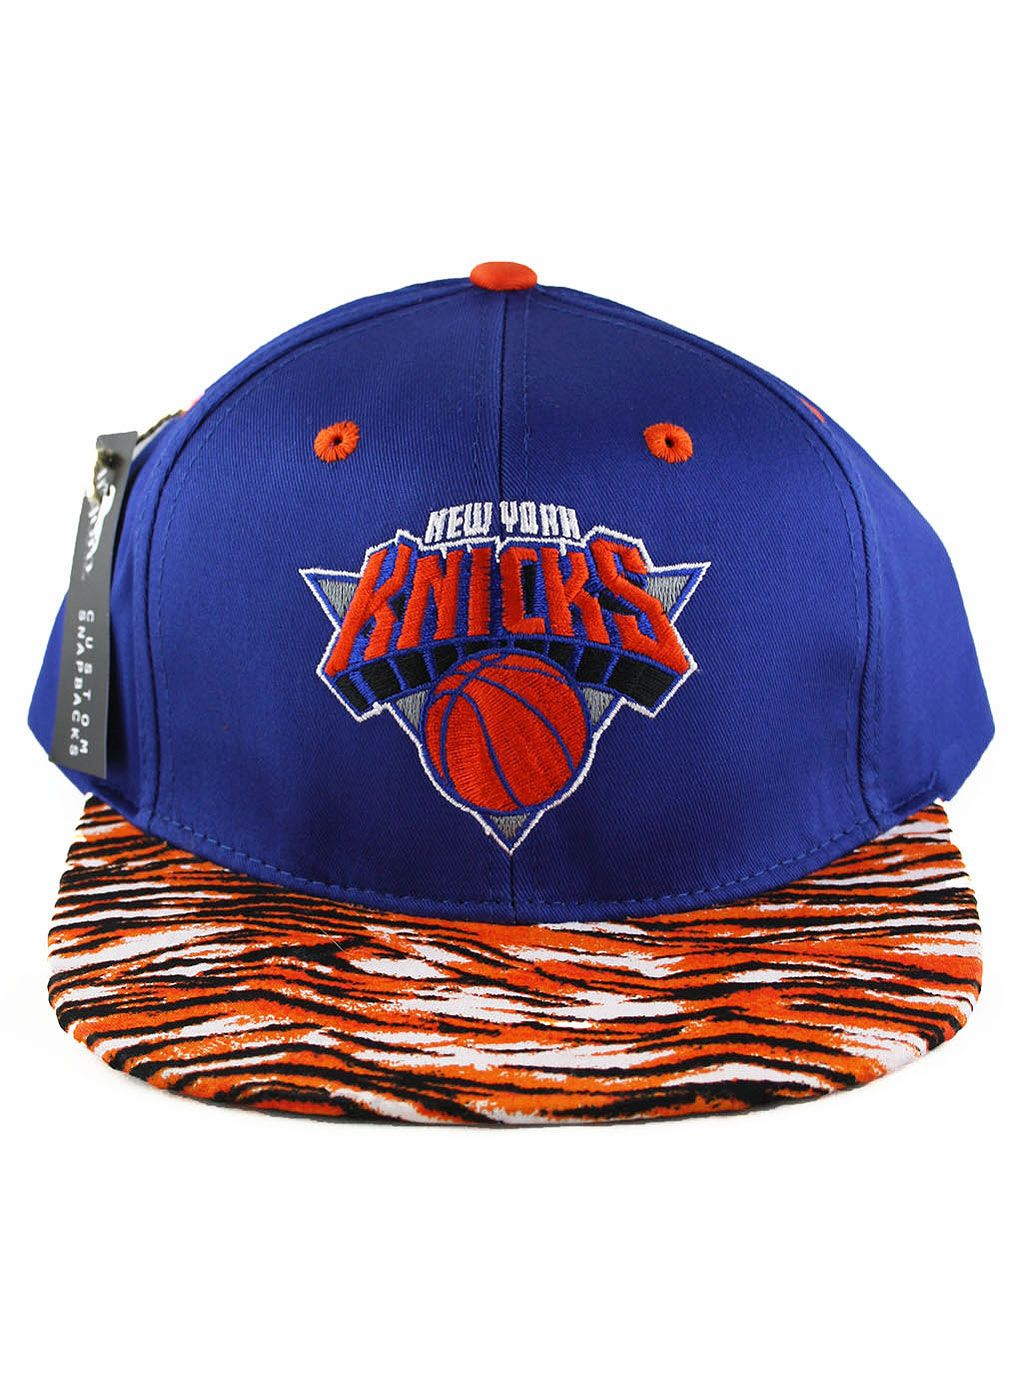 Agora Vintage New York Knicks Snapback Hat  076637b823e